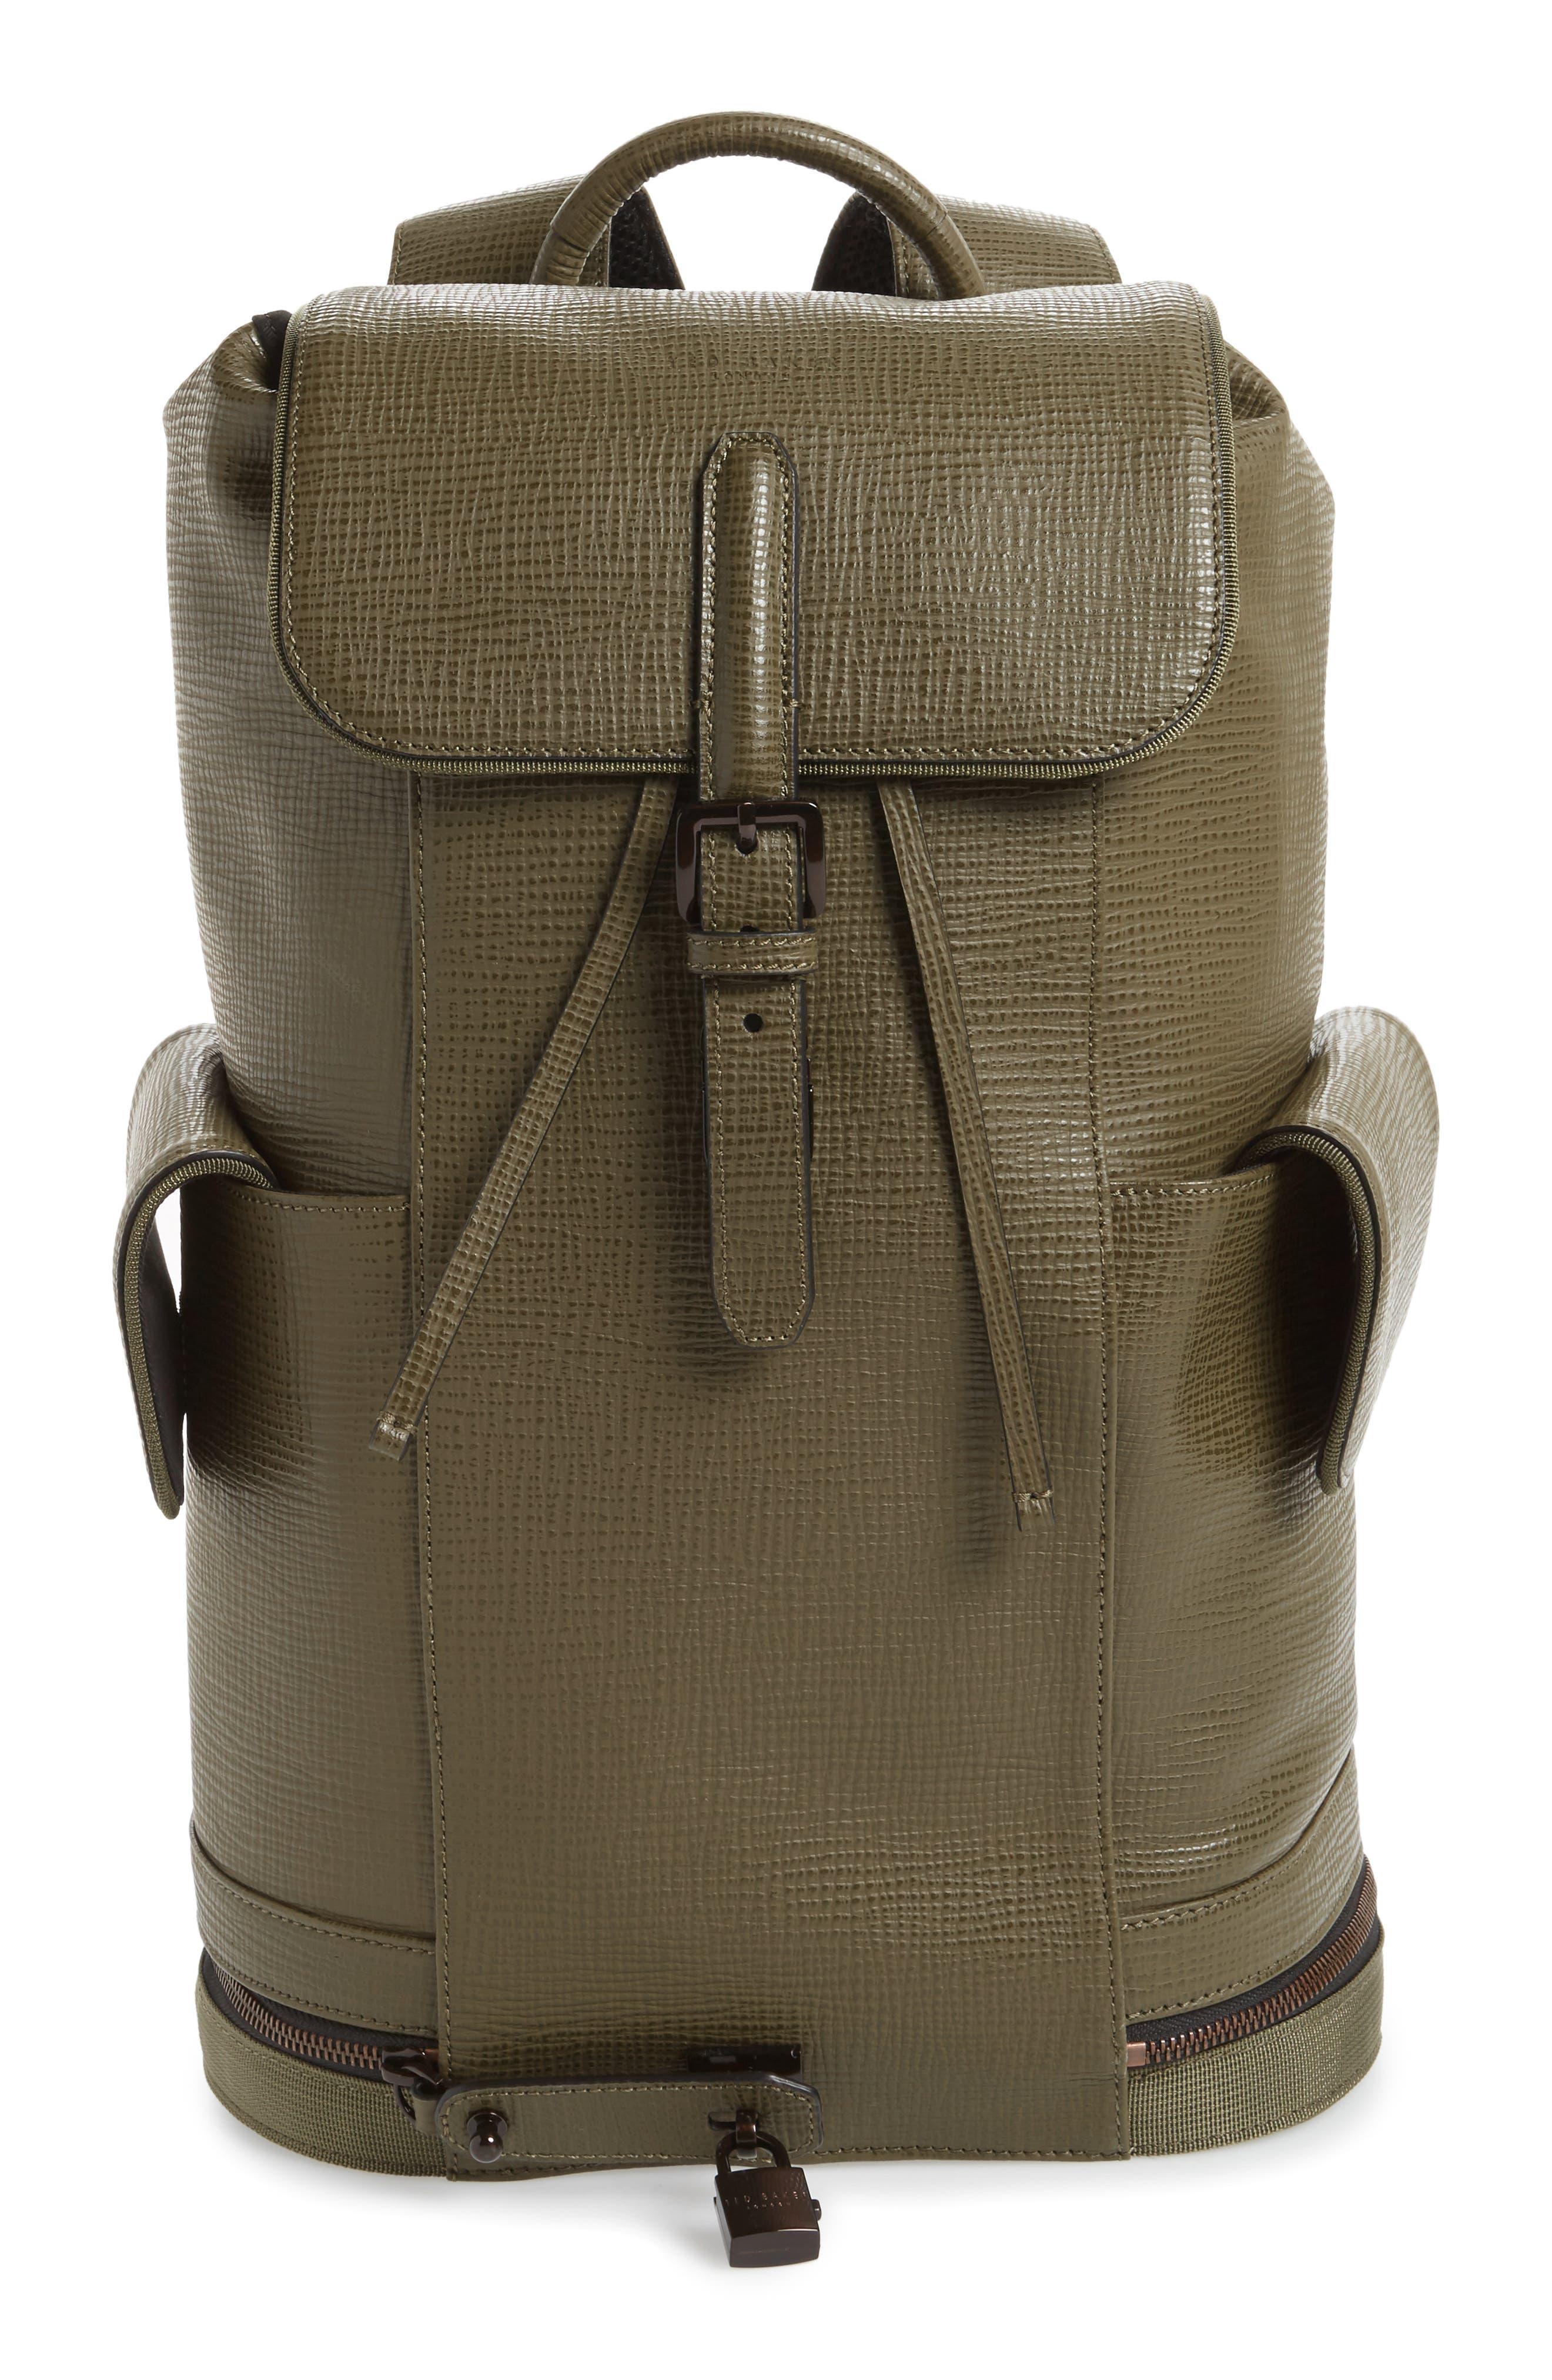 Thorr Palmelato Backpack,                             Main thumbnail 1, color,                             Olive